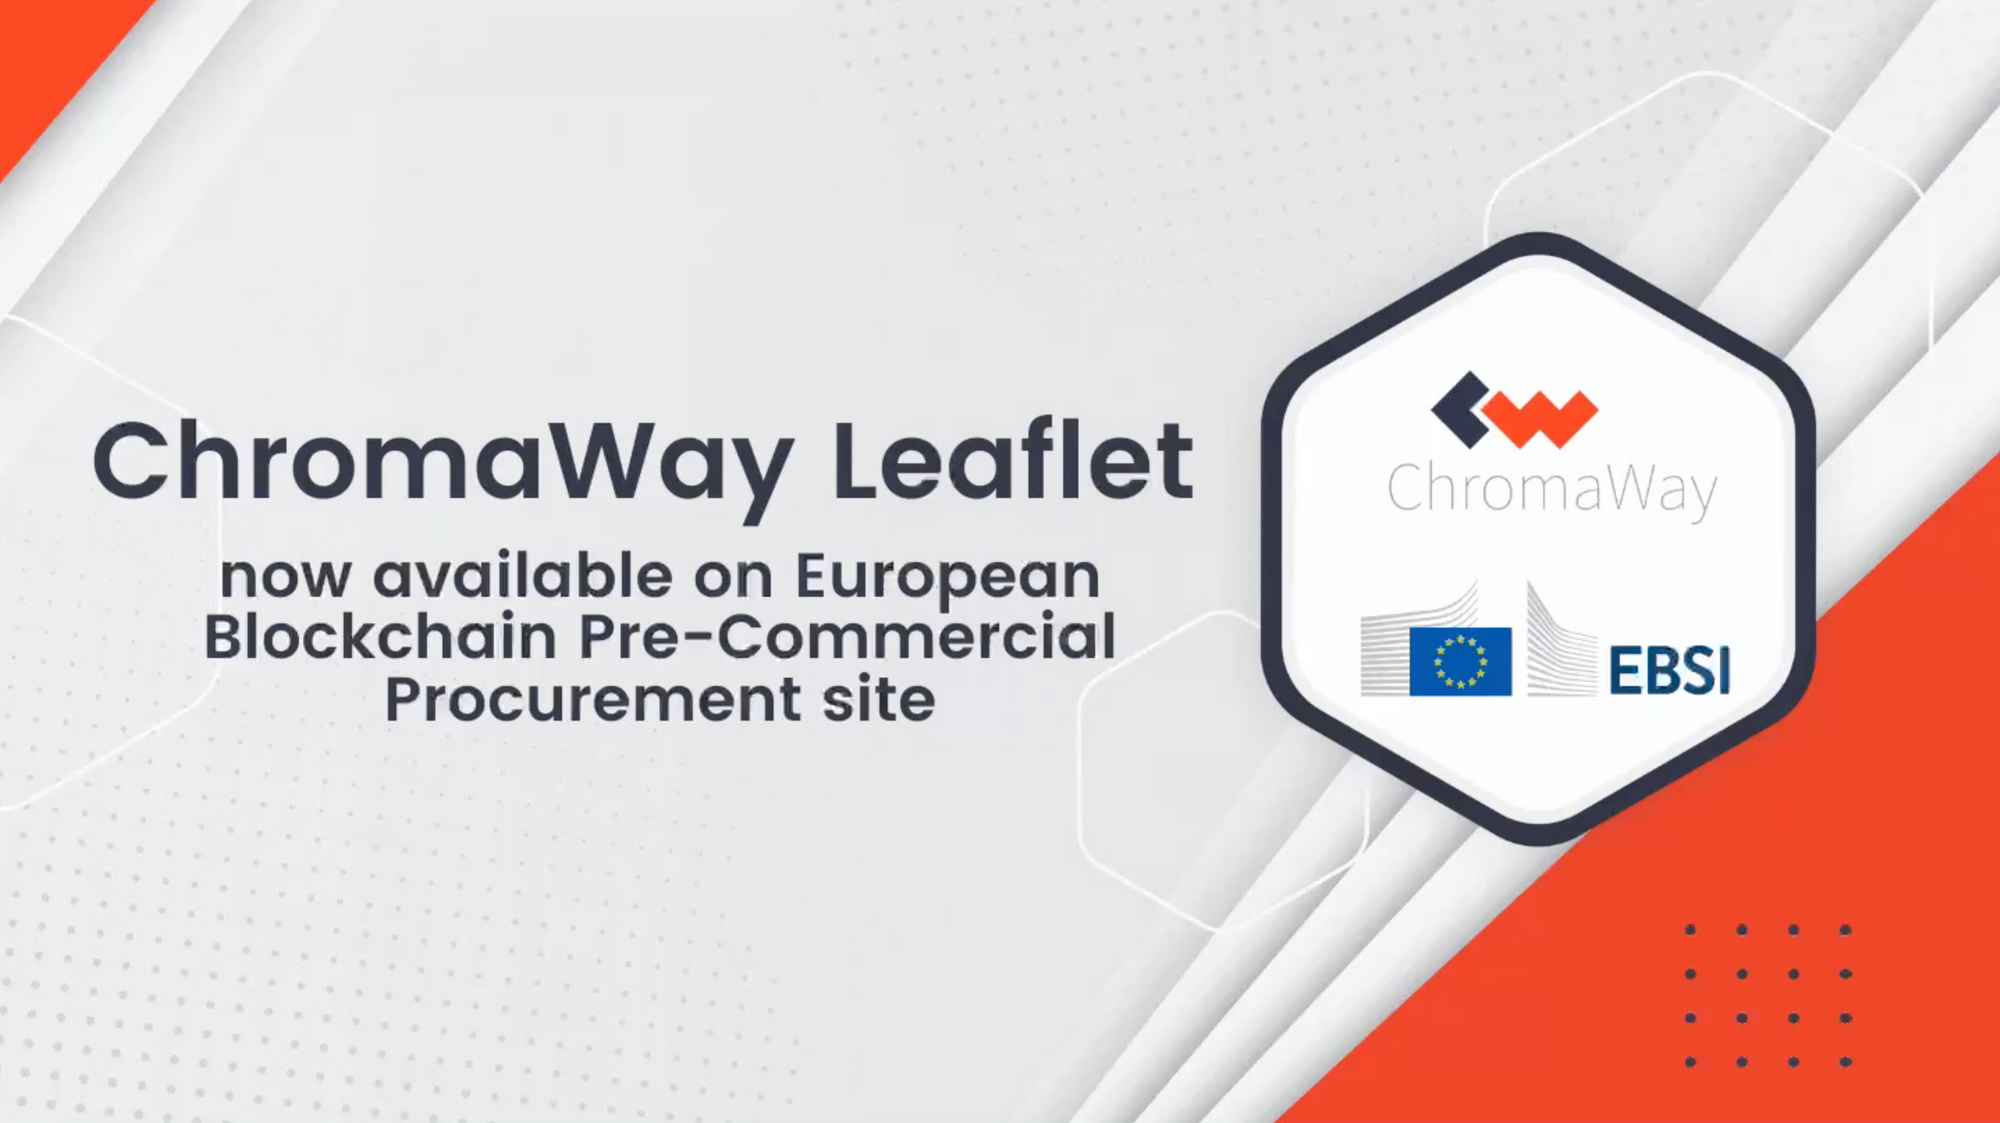 Five Takeaways from European Blockchain Services Infrastructure (EBSI) Procurement Contract